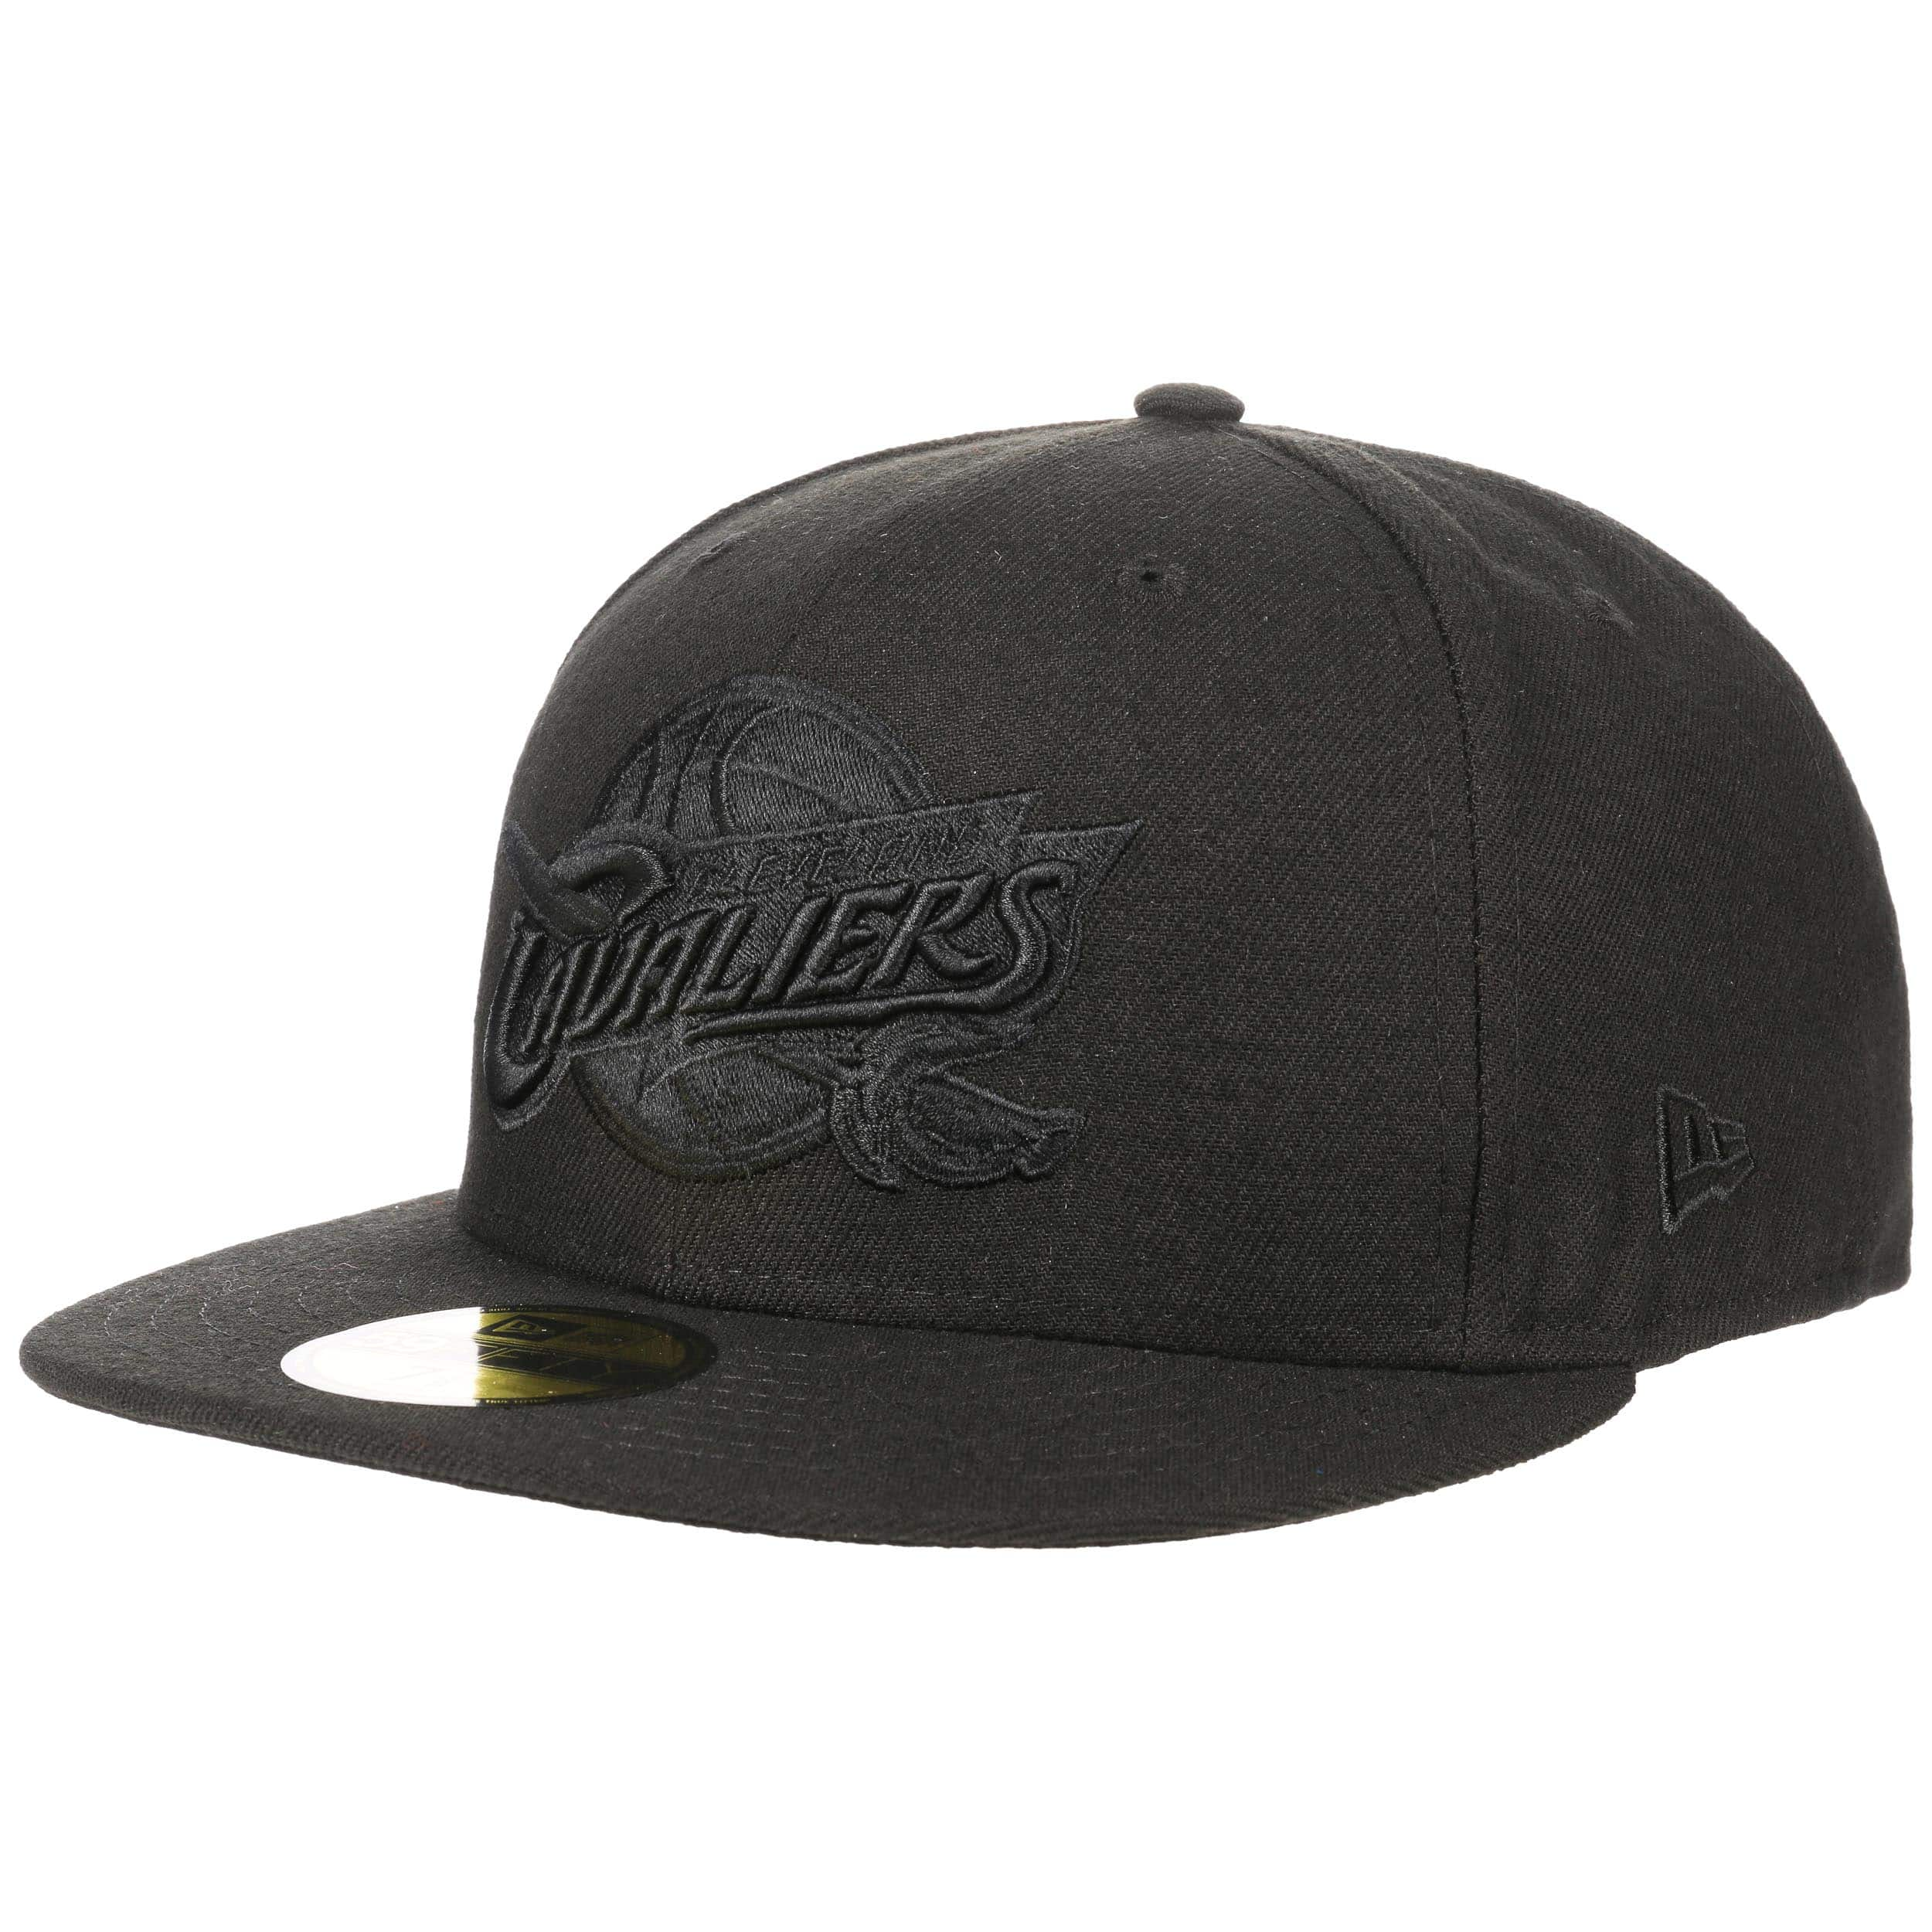 59fifty cleveland cavs bob cap by new era eur 37 95 hats caps beanies shop online. Black Bedroom Furniture Sets. Home Design Ideas